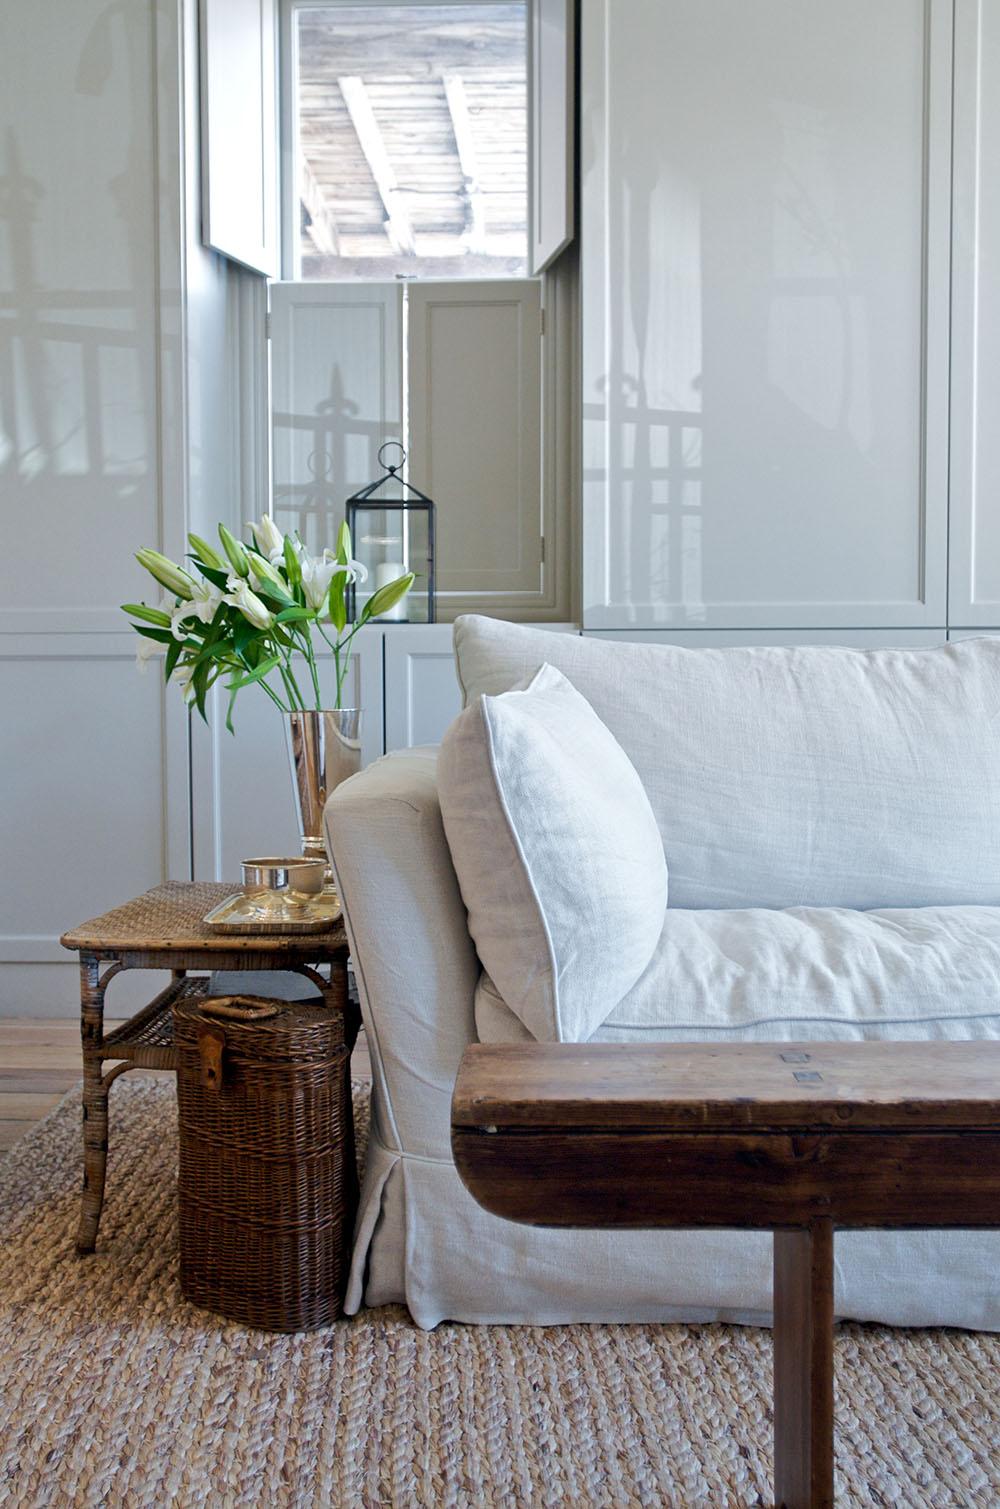 Leo_Designs_Chicago_interior_design_swedish_inspired24.jpg